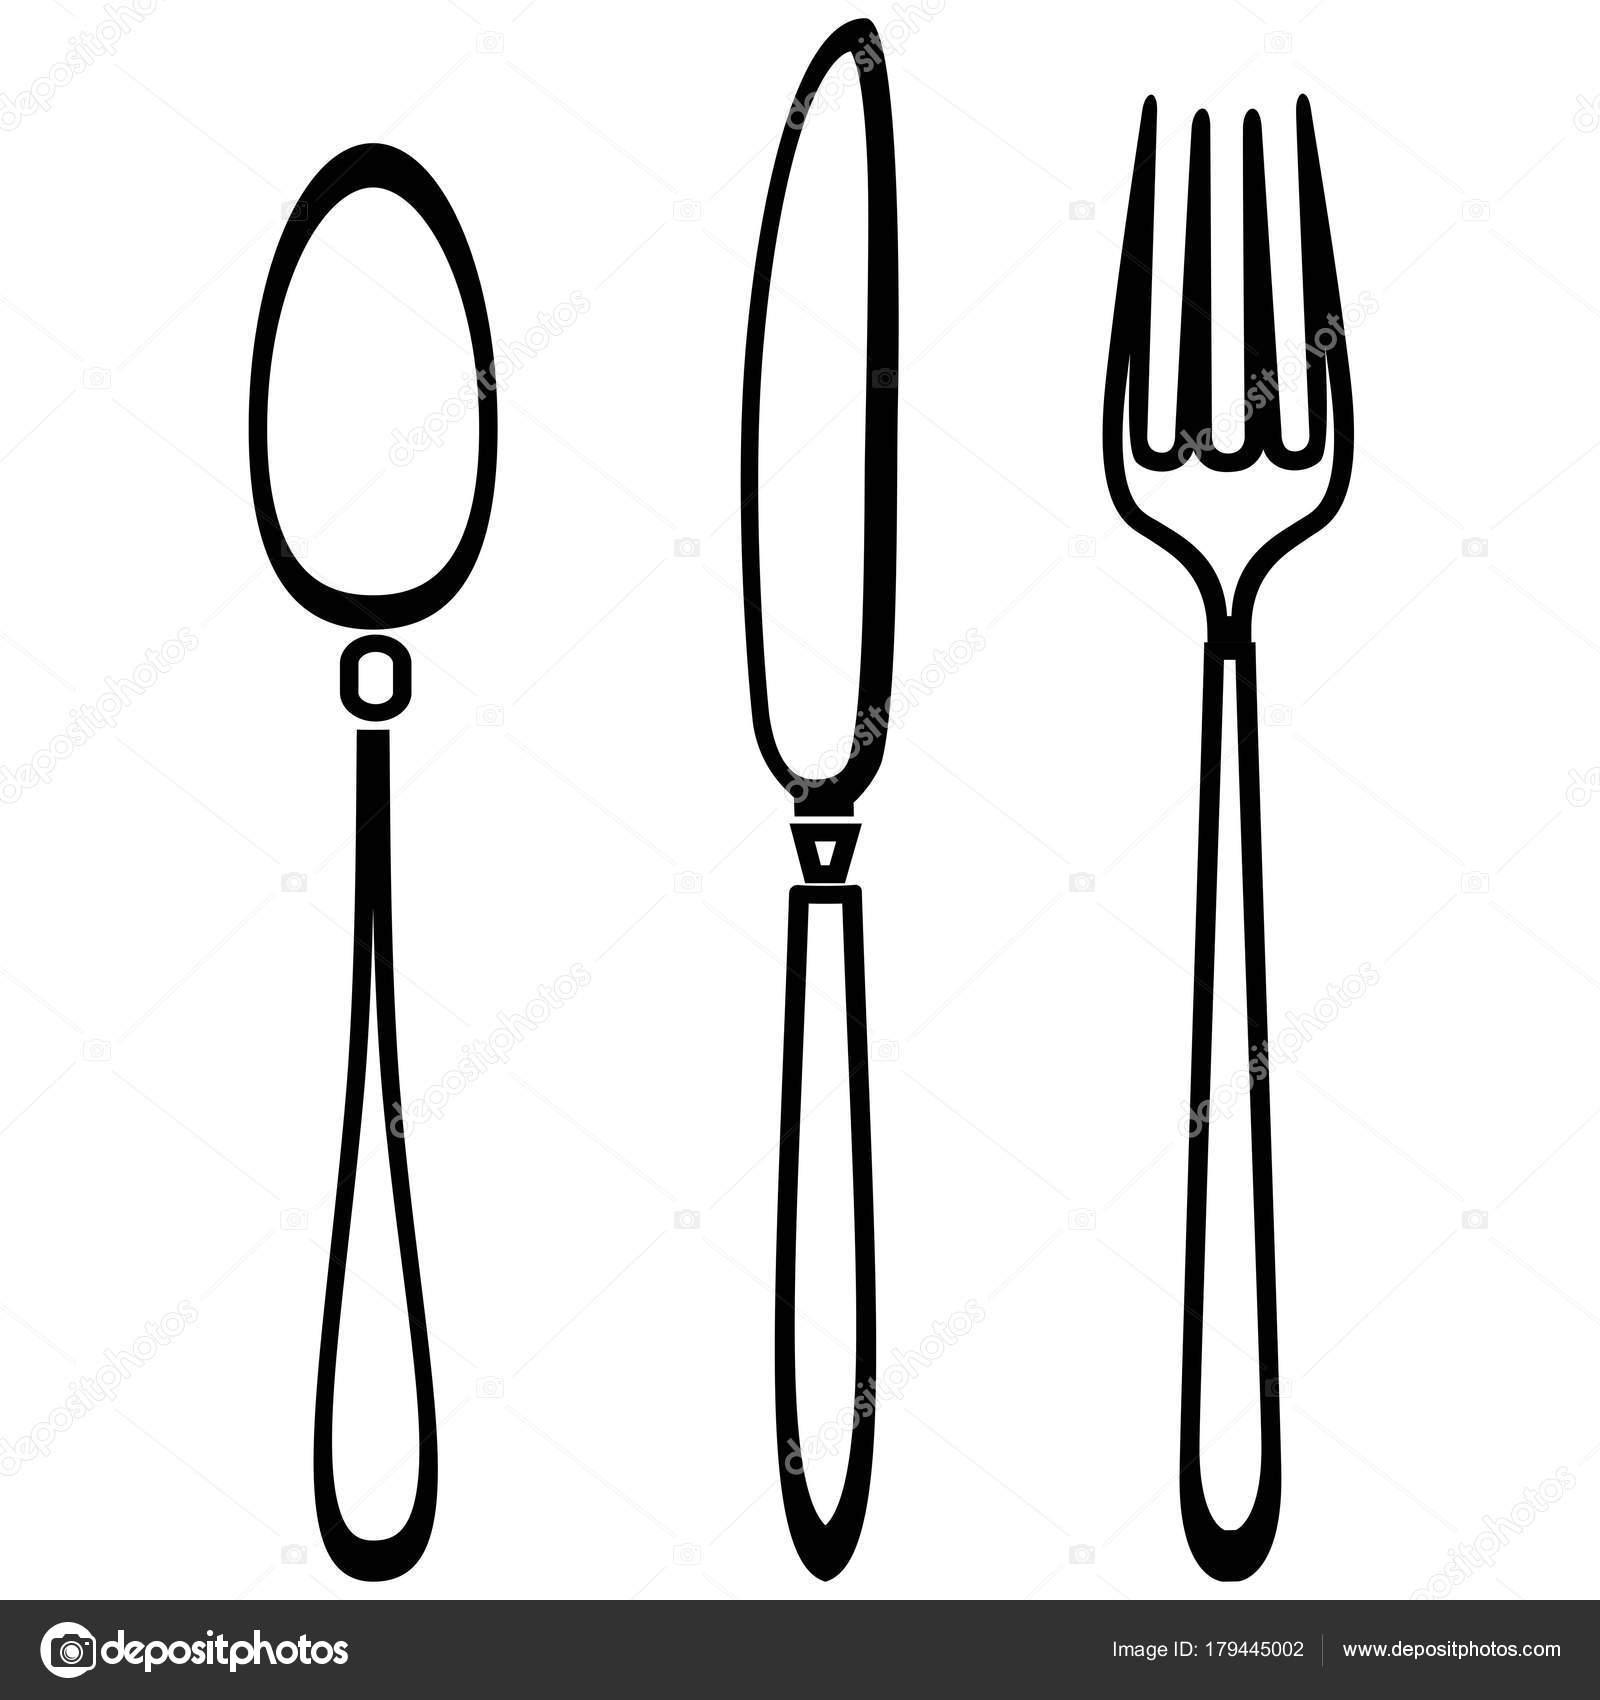 cuchara tenedor y cuchillo esquema conjunto vector de knife and fork clipart image knife and fork images clip art